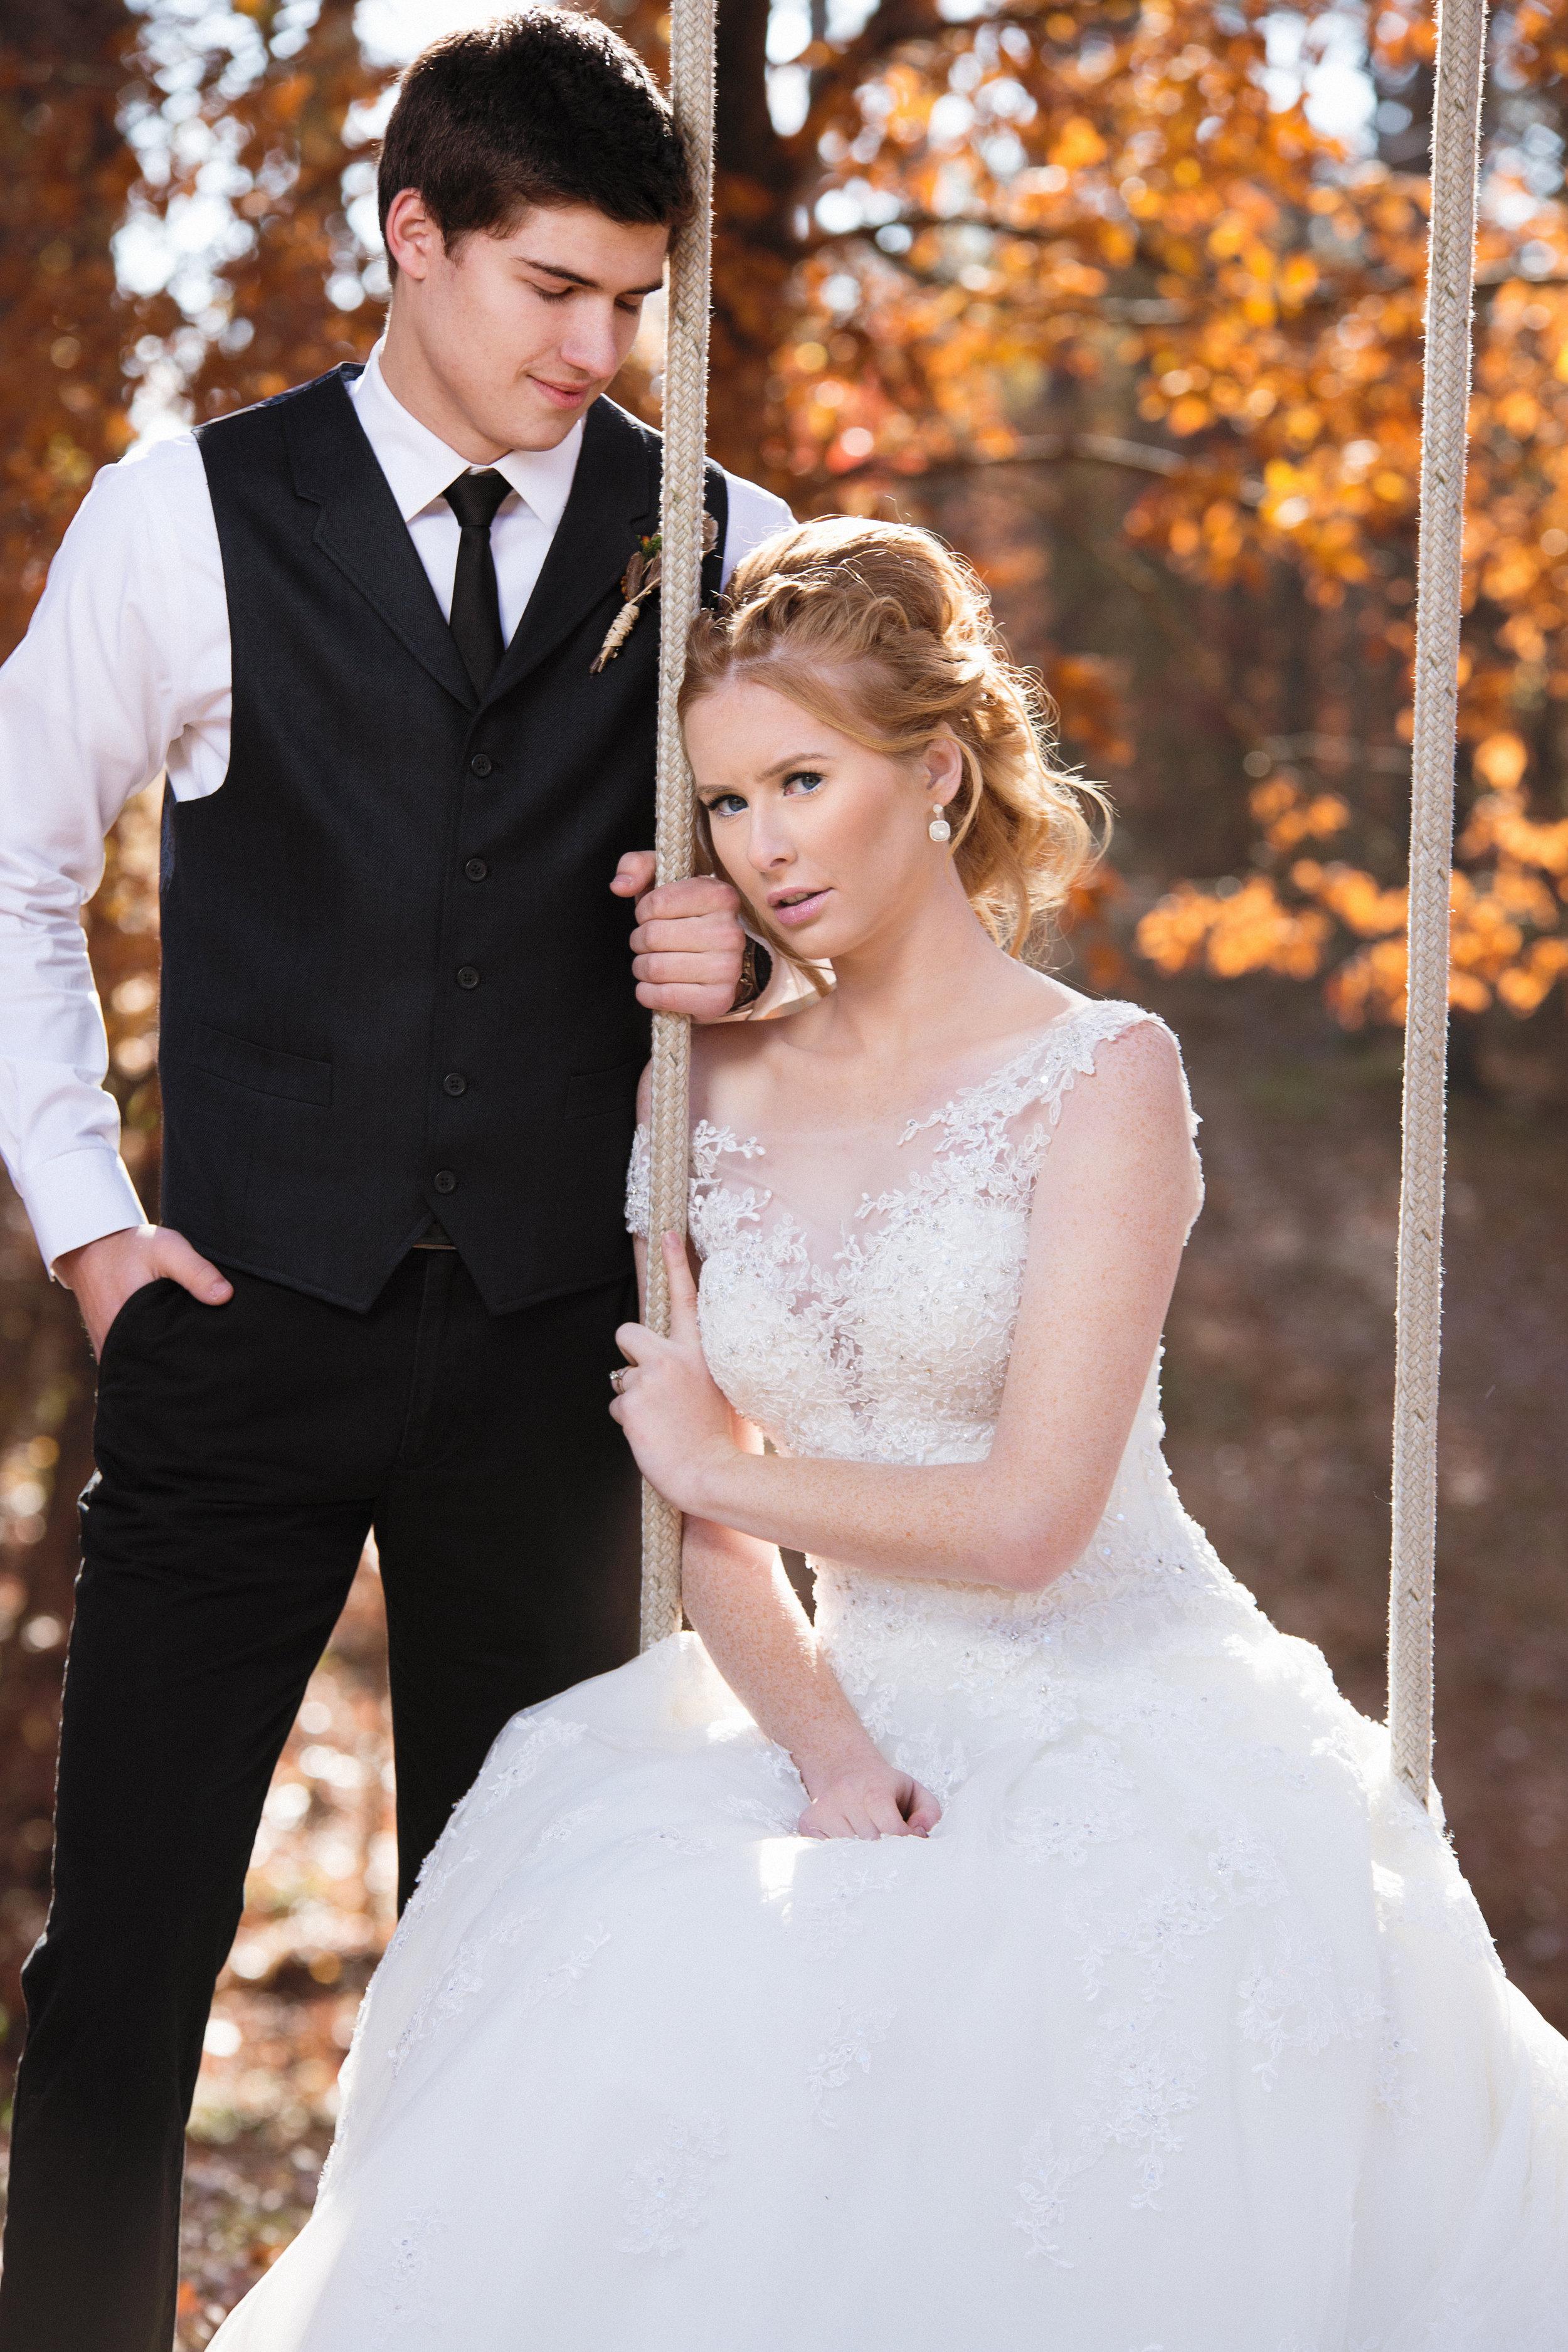 Pheauxtography_WeddingConcept-10.jpg